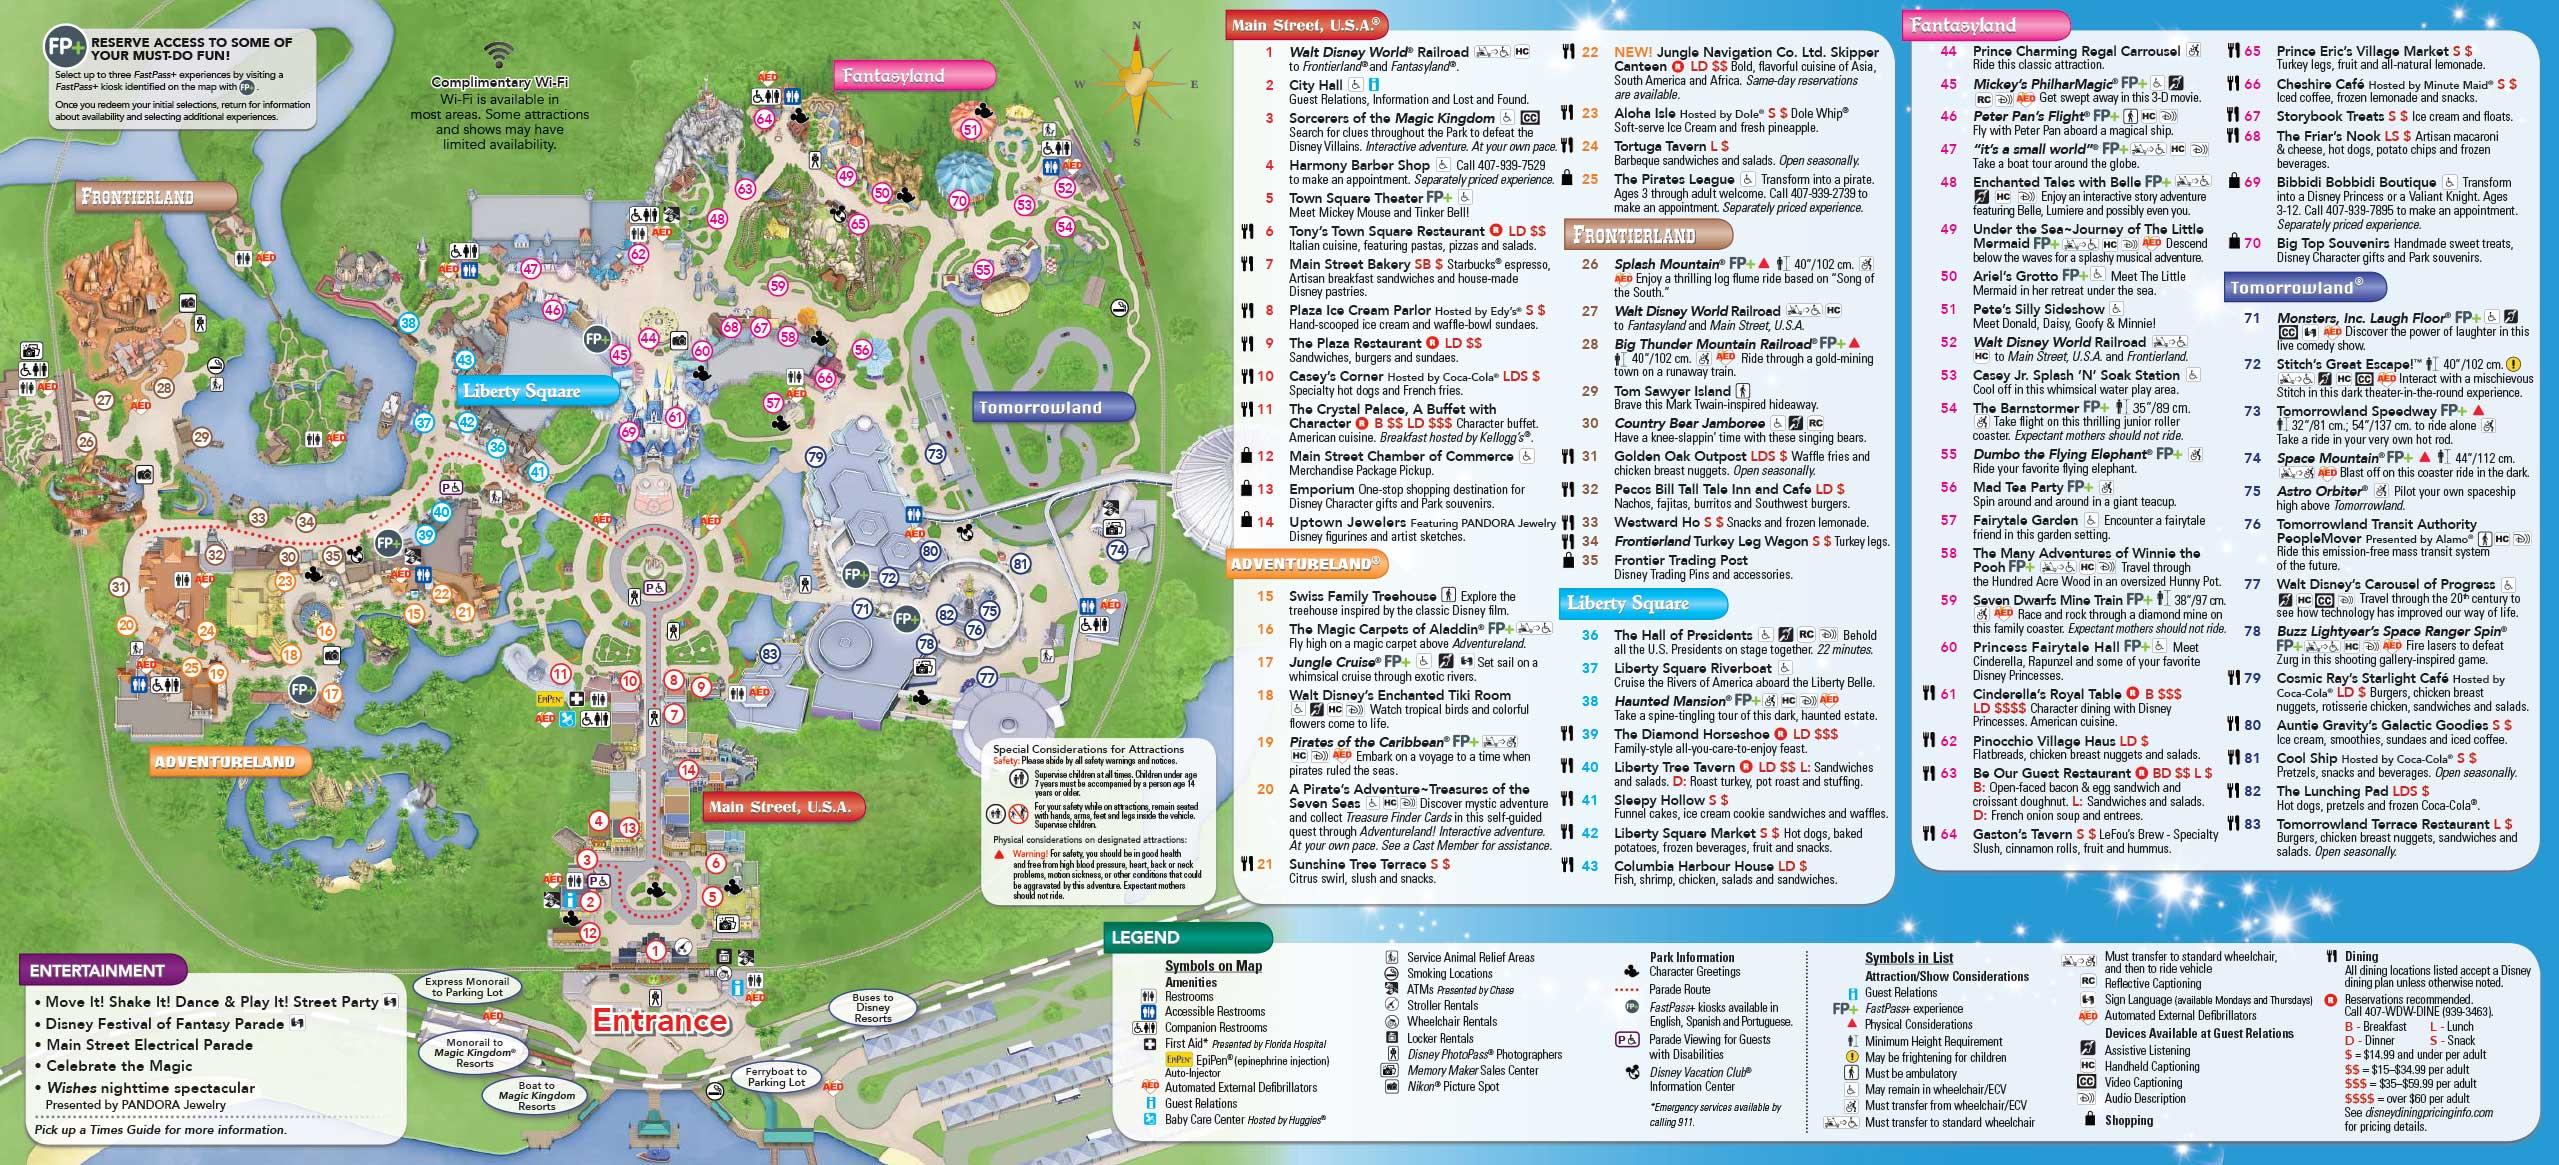 June Walt Disney World Park Maps Photo Of - Us open grounds map 2017